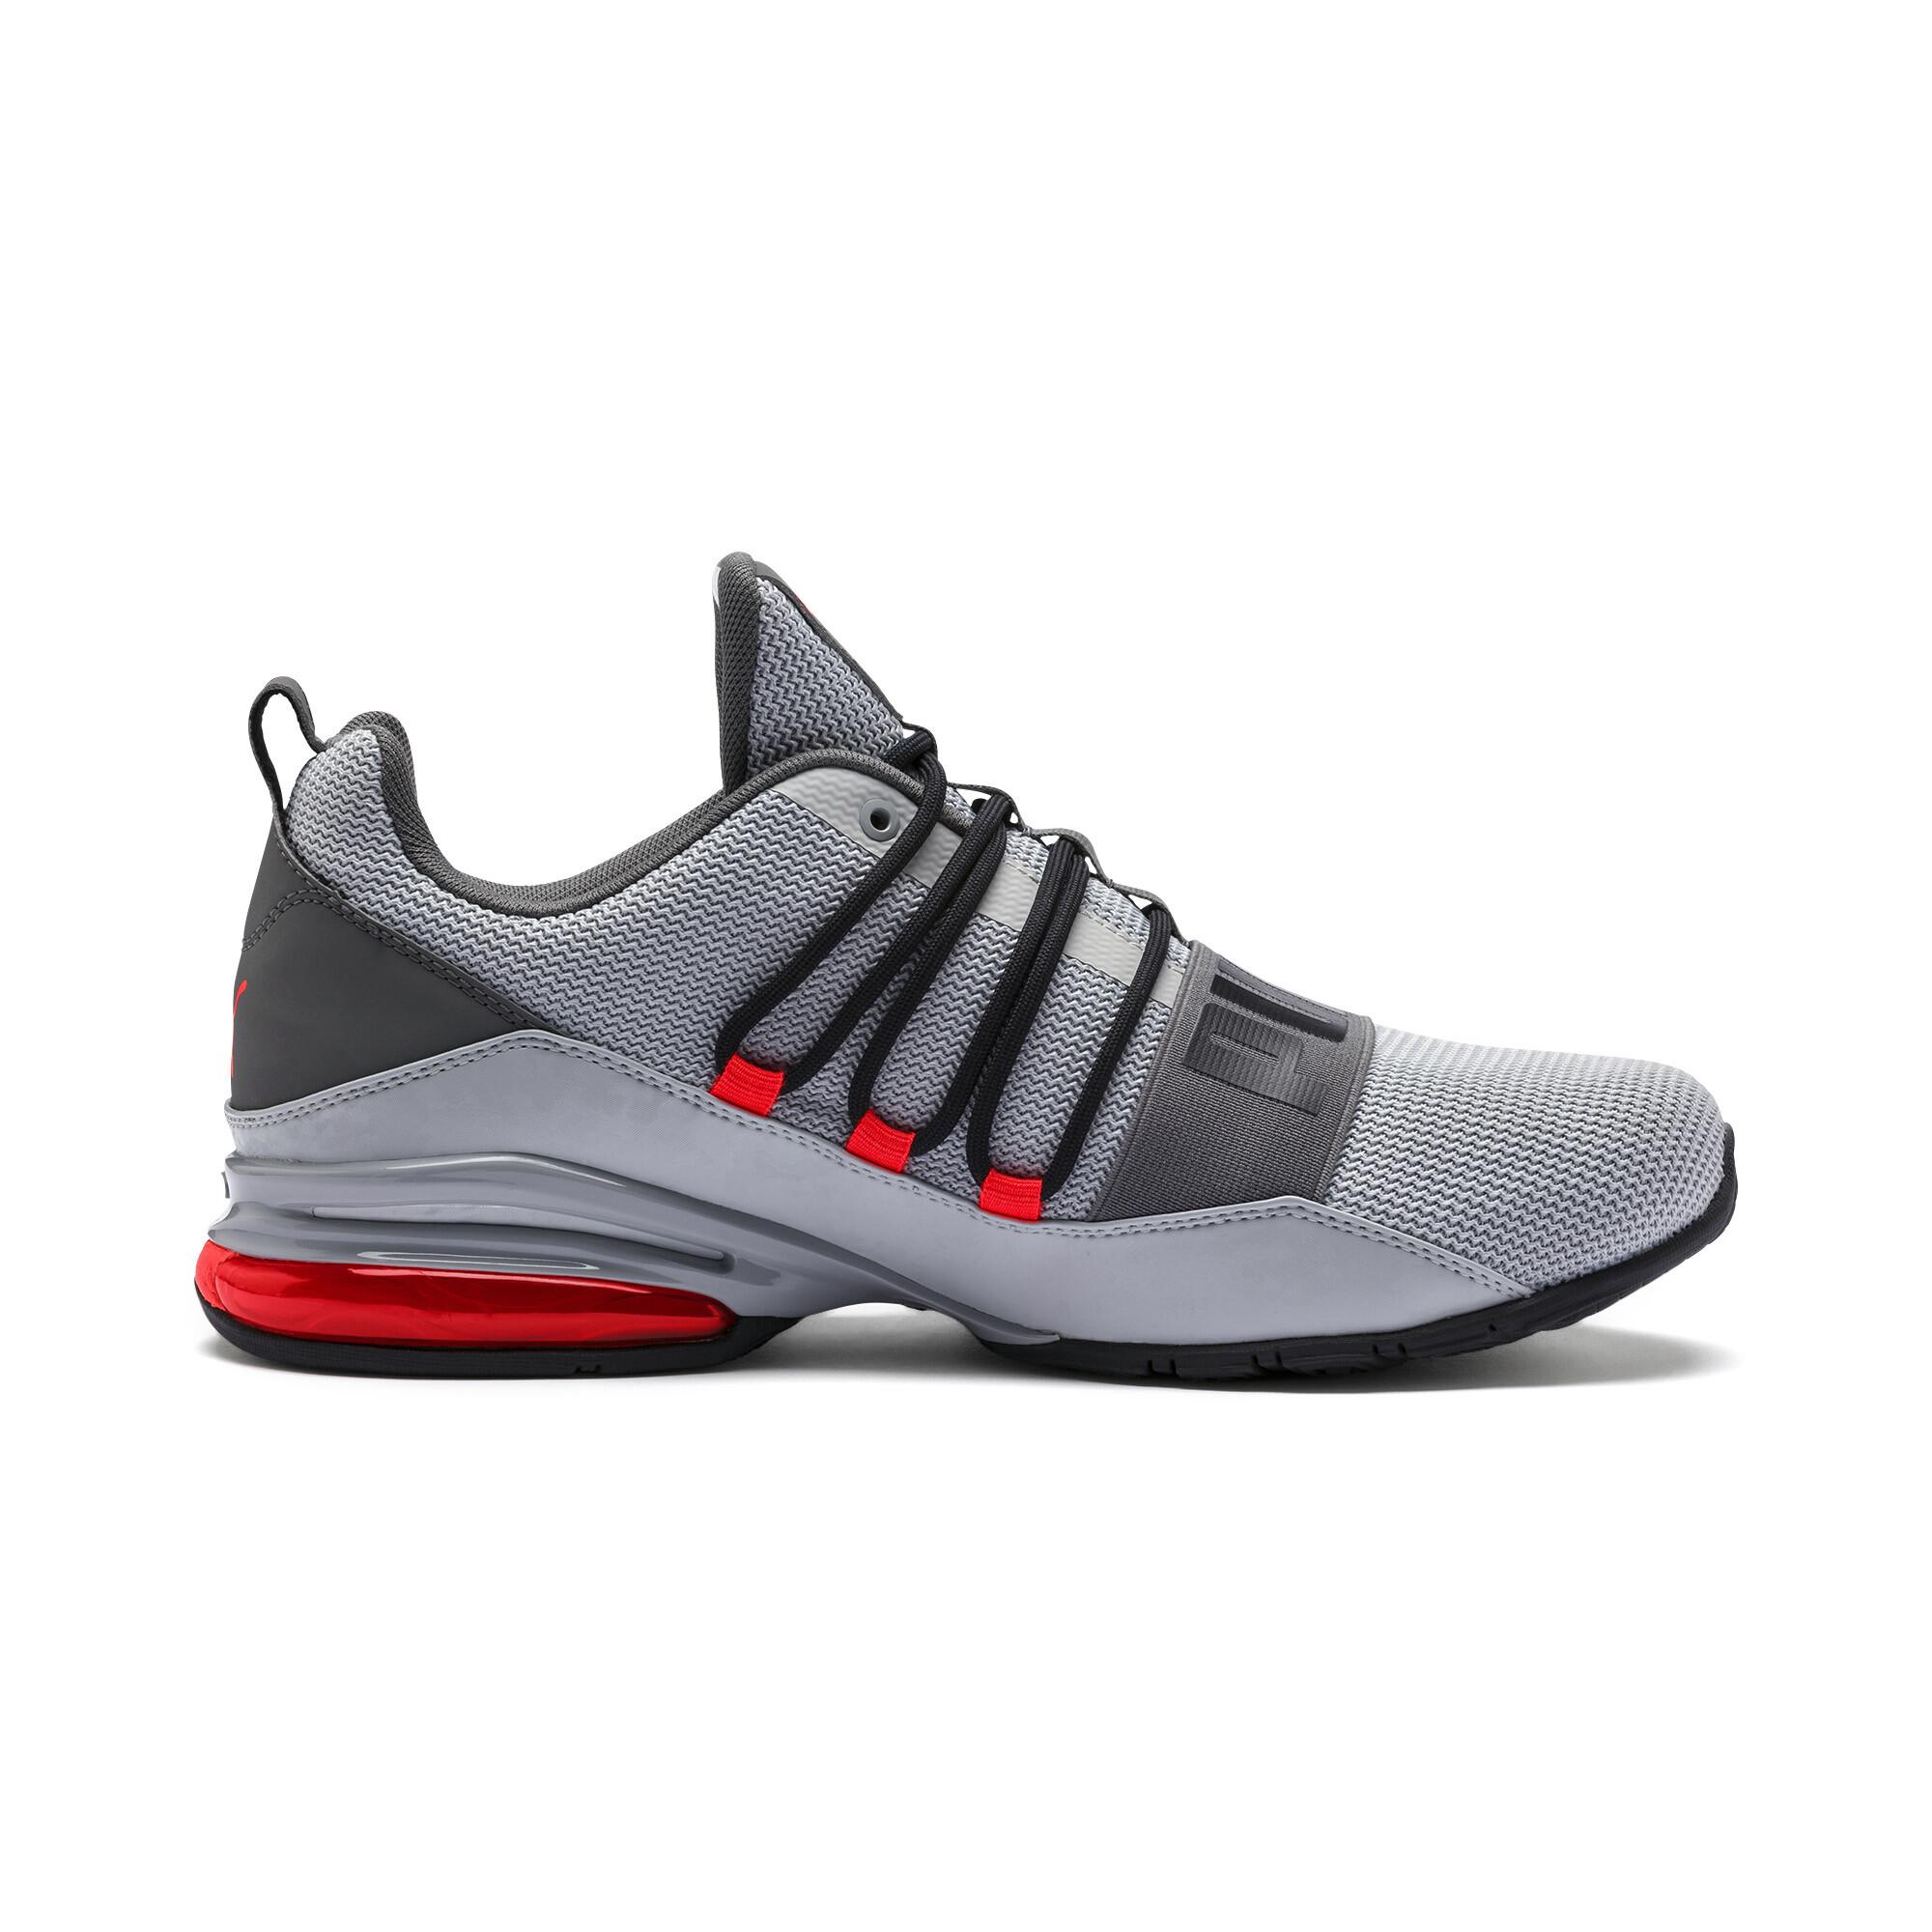 PUMA-CELL-Regulate-Camo-Men-s-Training-Shoes-Men-Shoe-Running thumbnail 7